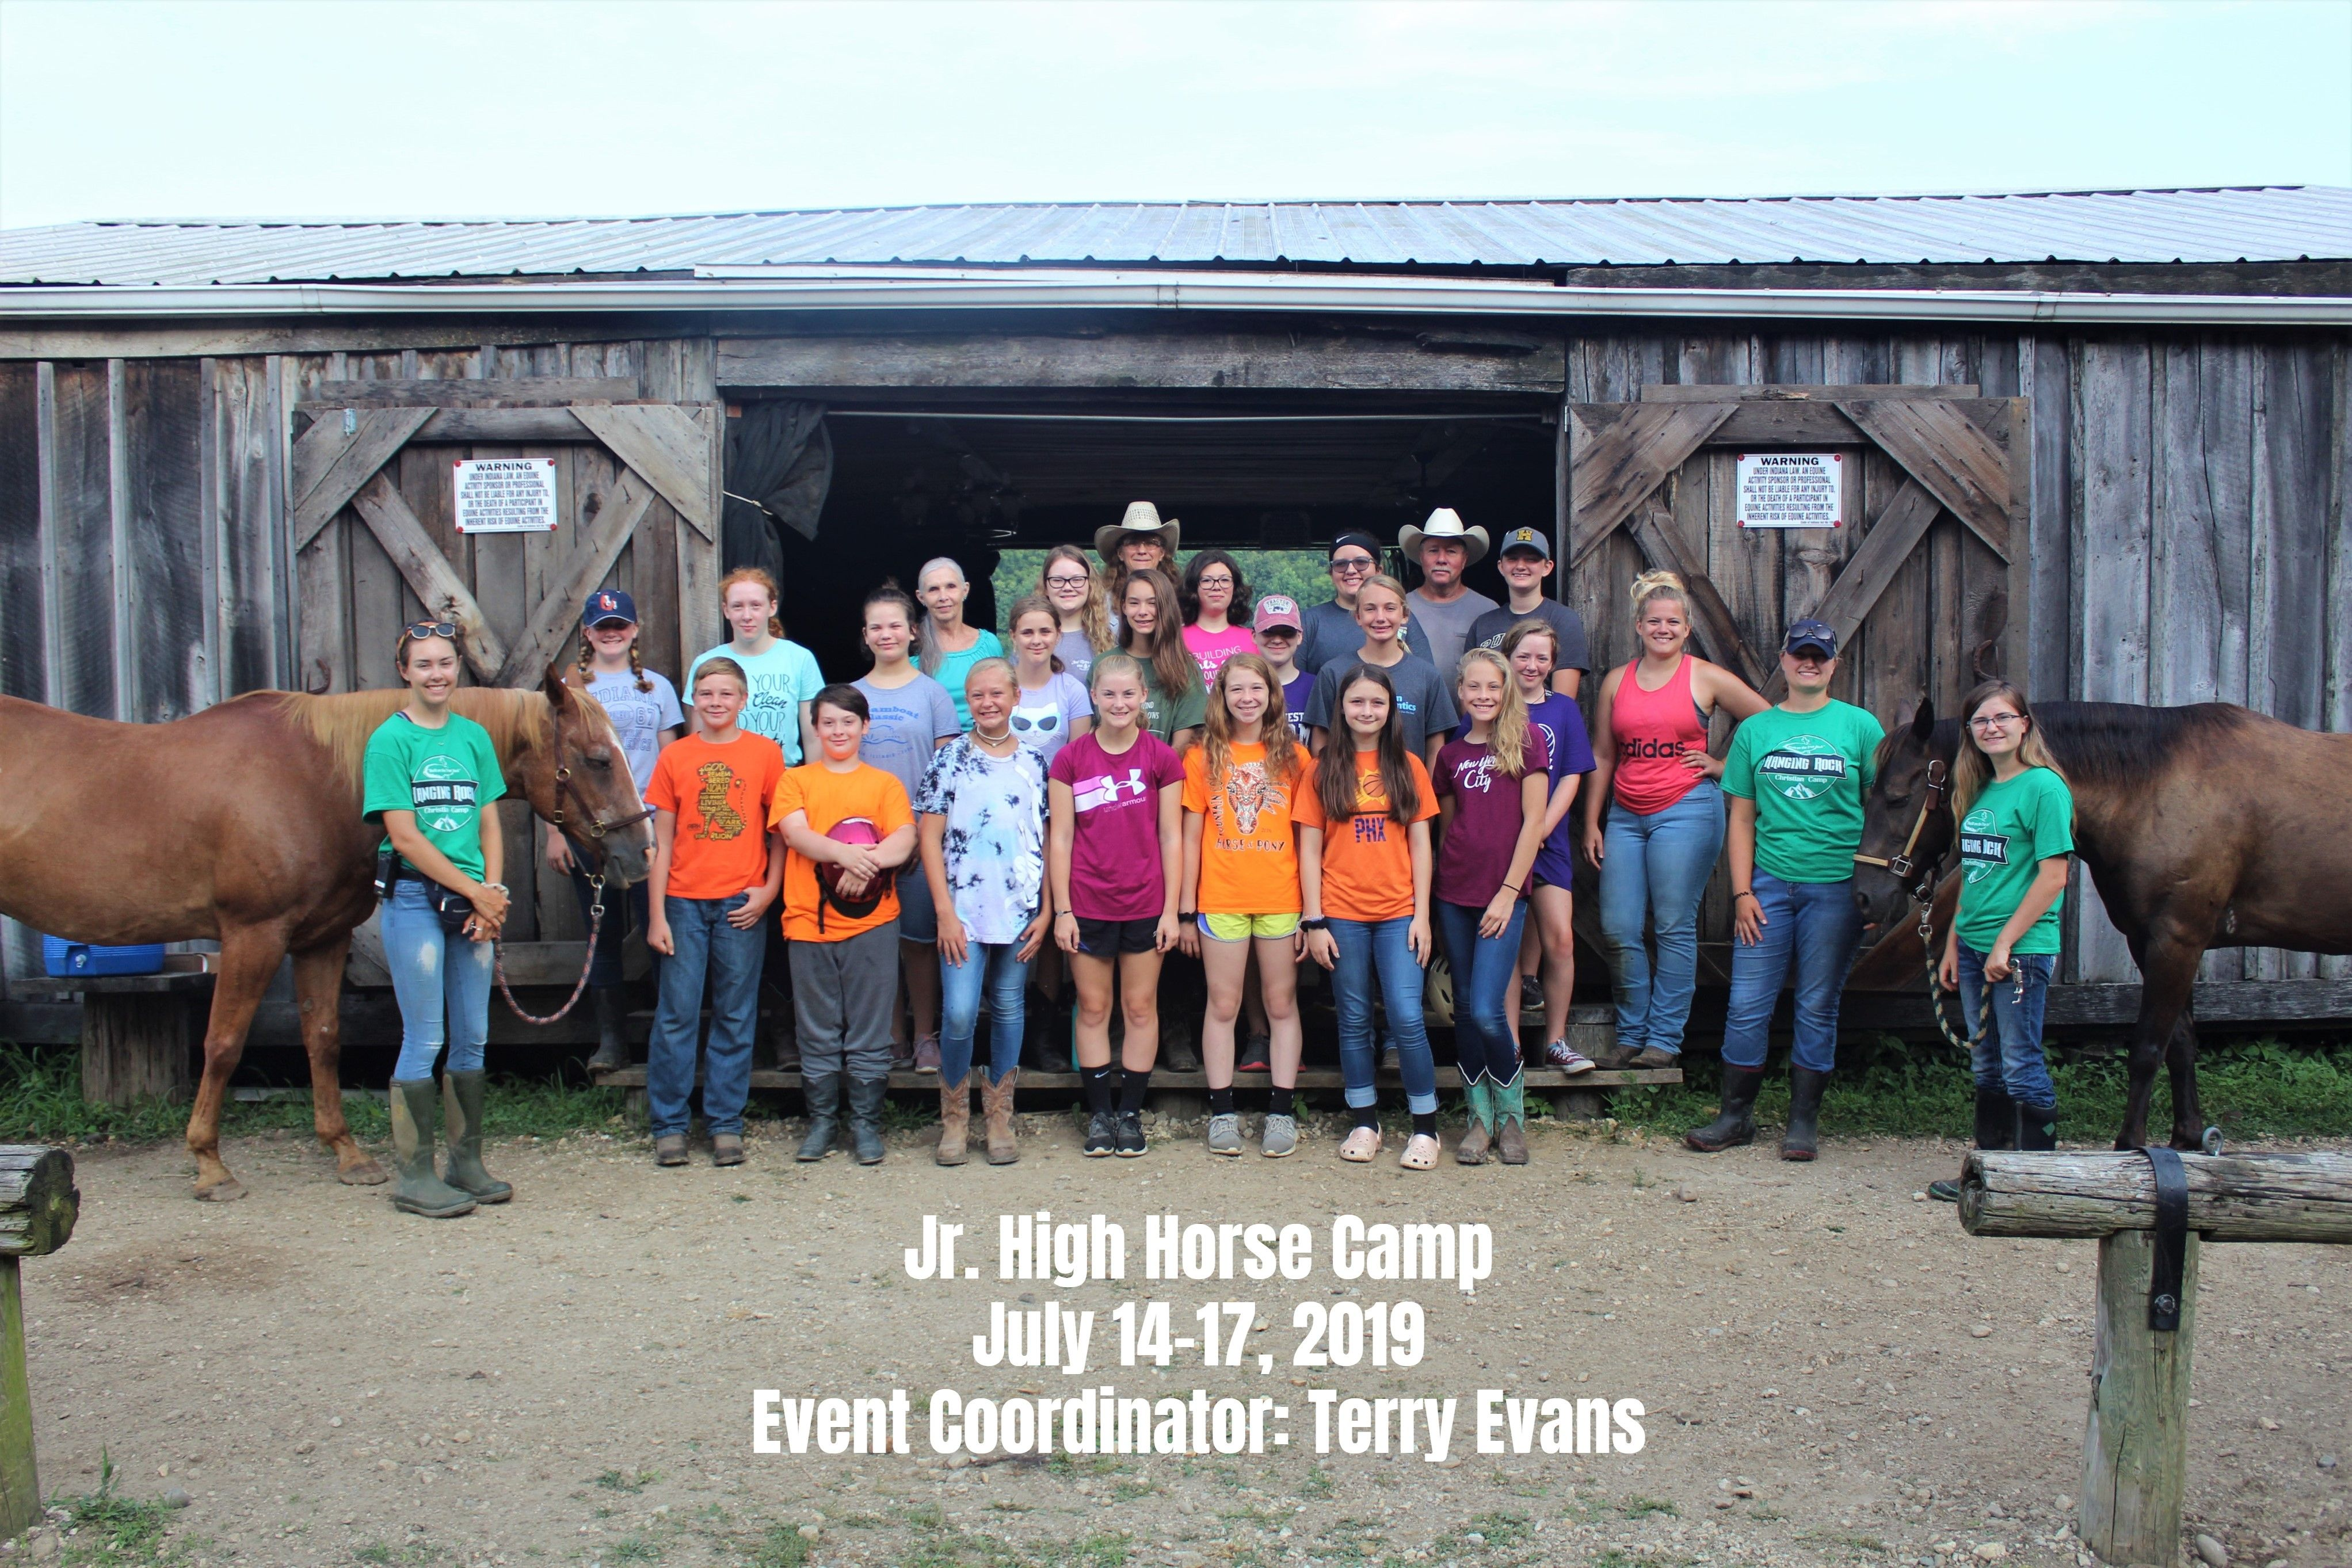 Jr. High Horse Camp